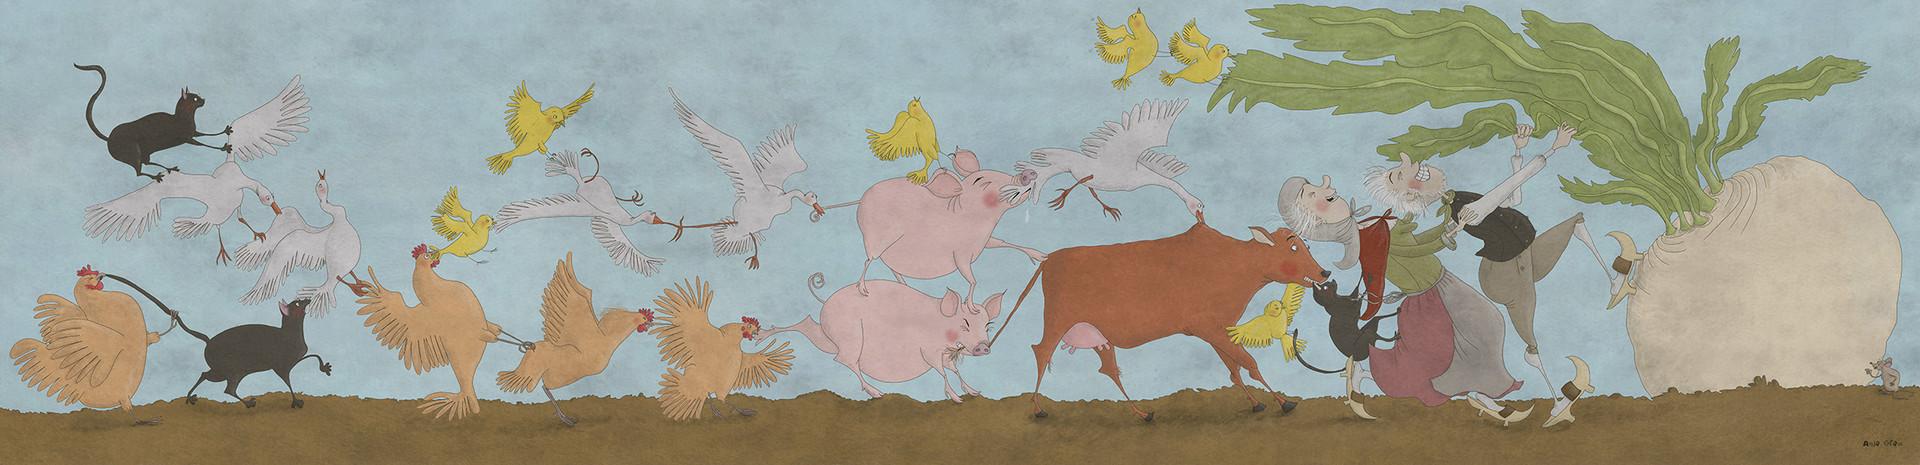 Illustration til Nakskov bibliotek